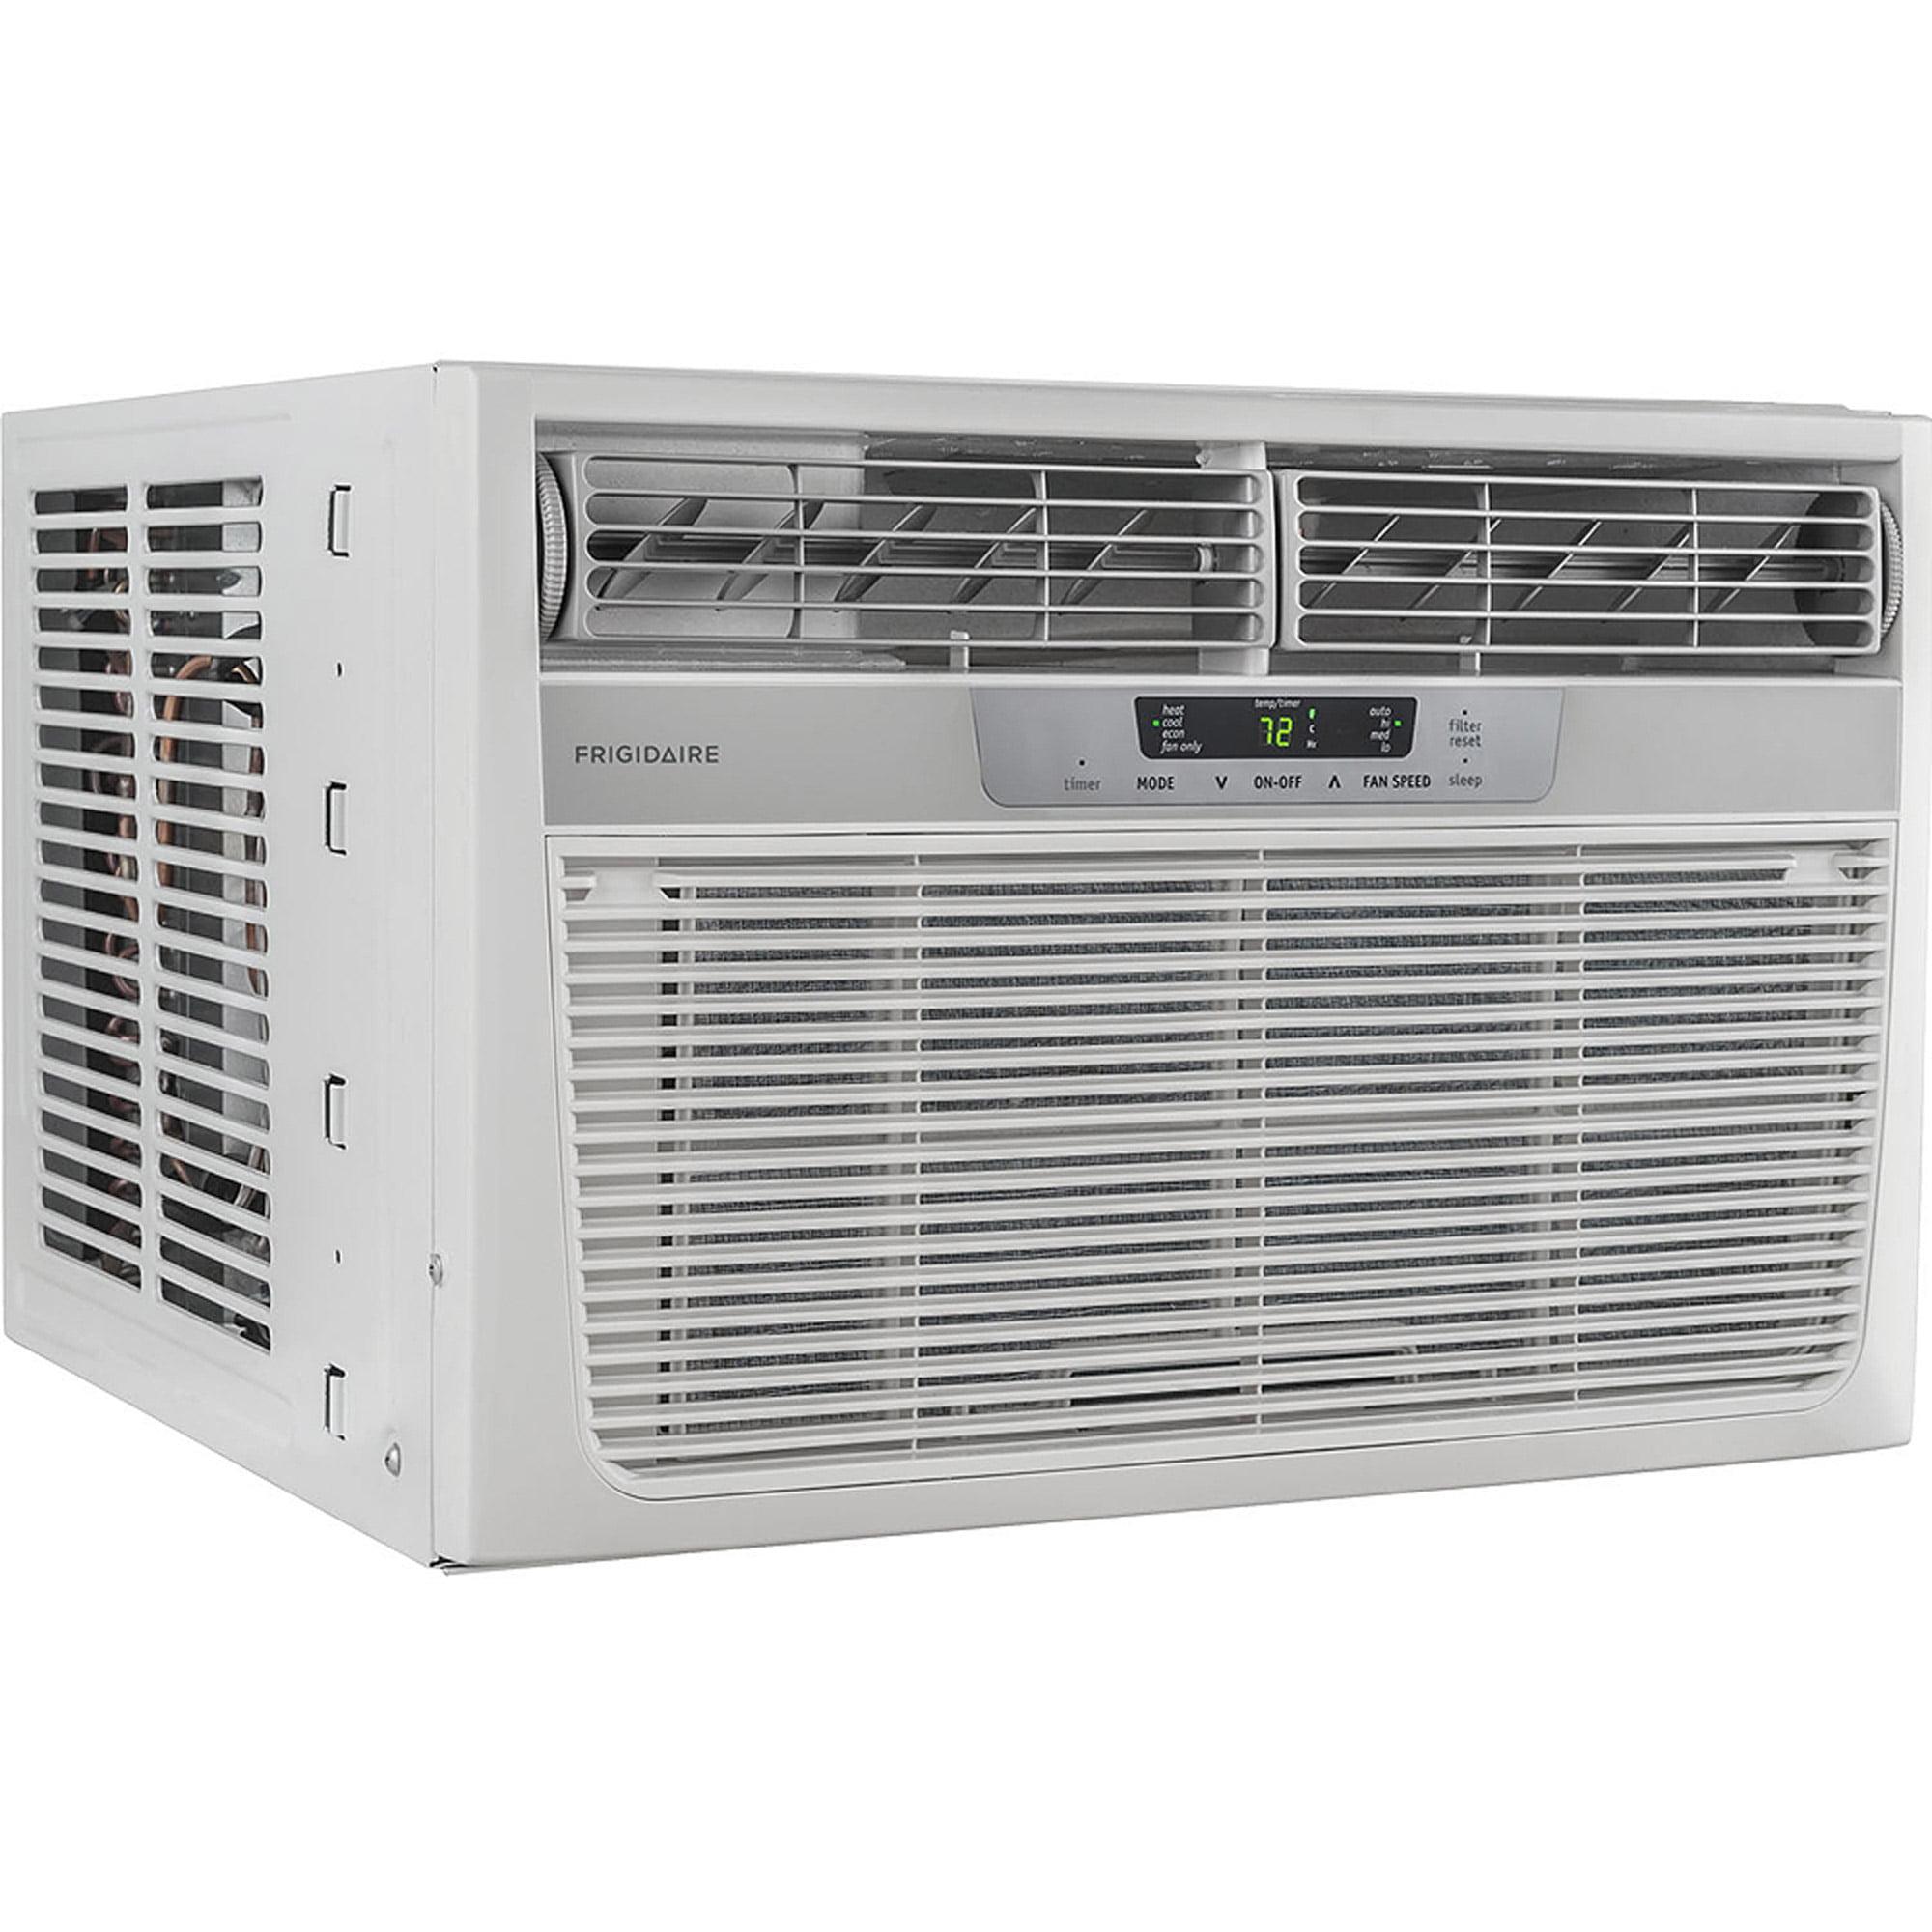 Frigidaire ffrh0822q1, frigidaire air conditioner ffrh0822q1, 012505278372